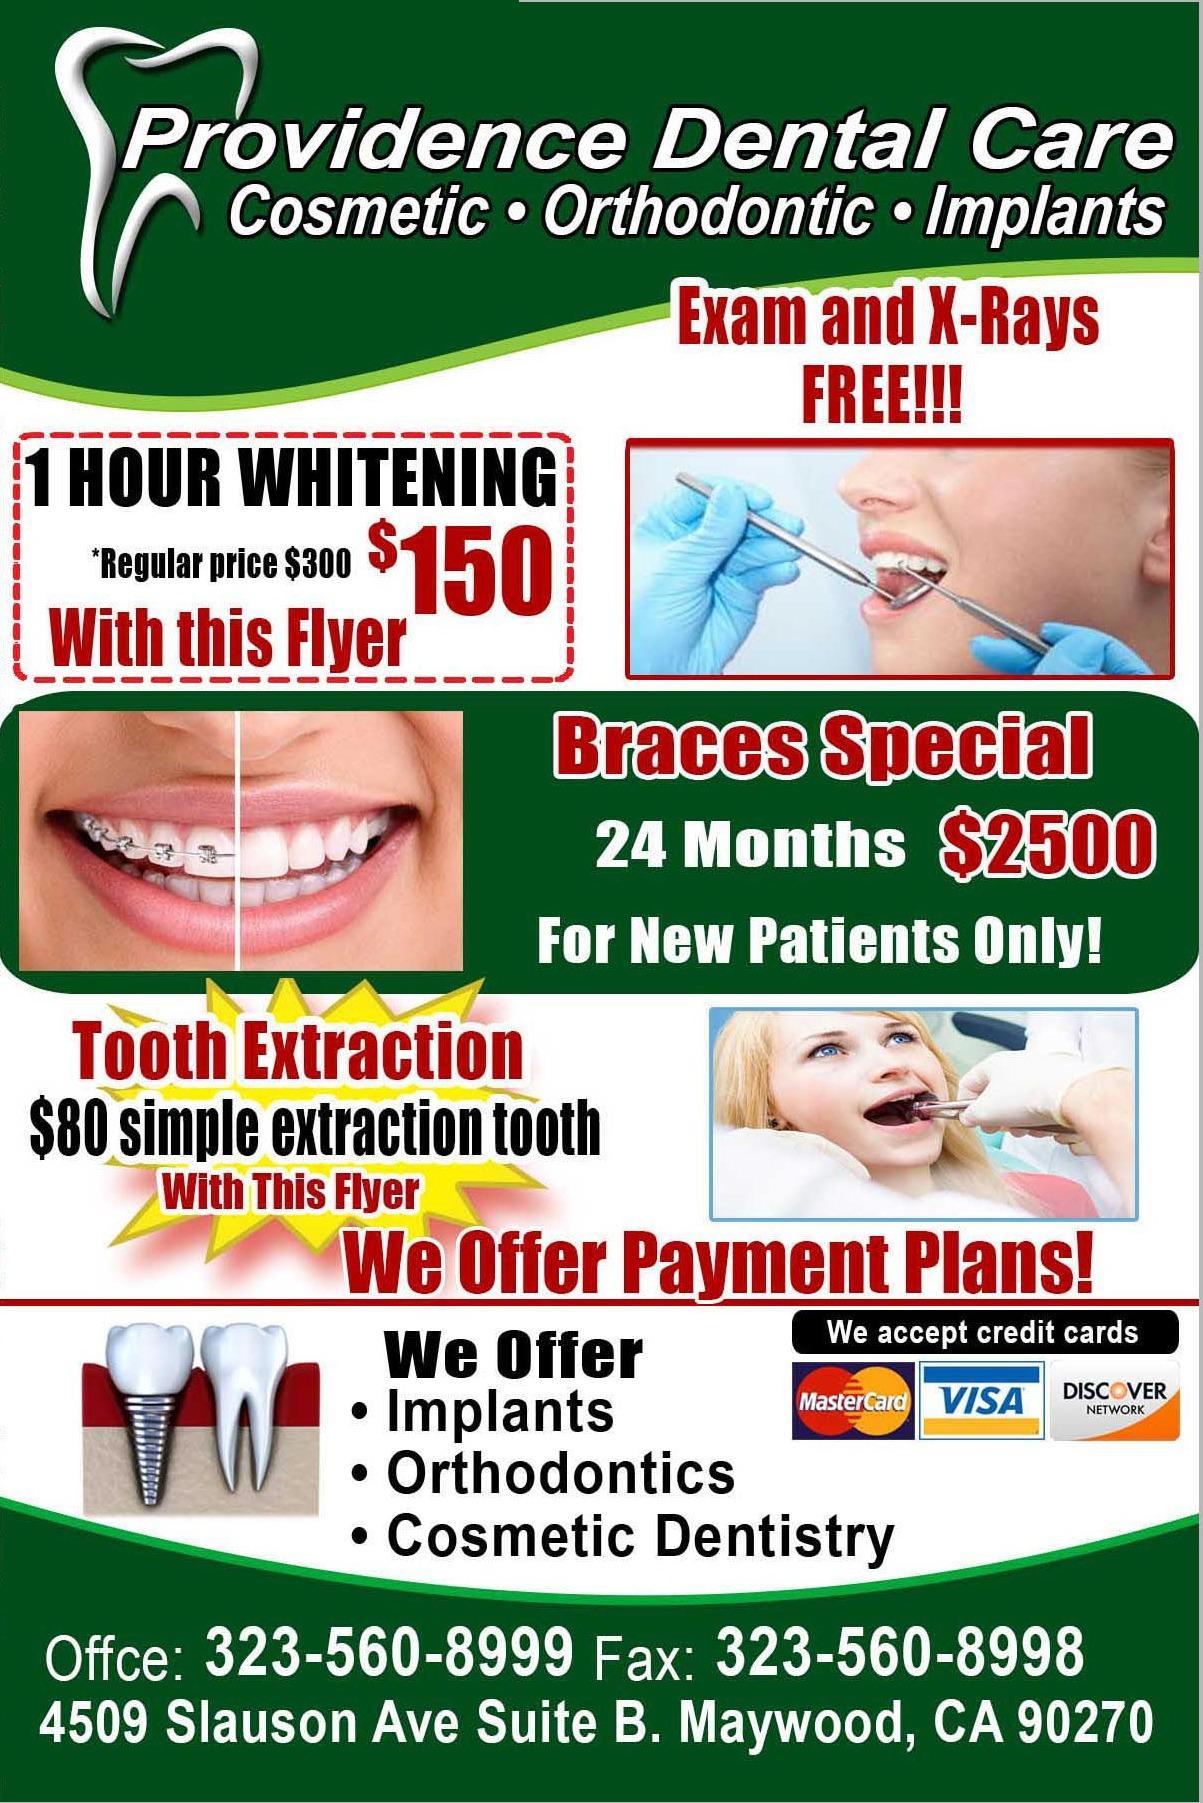 Providence Dental Care image 3